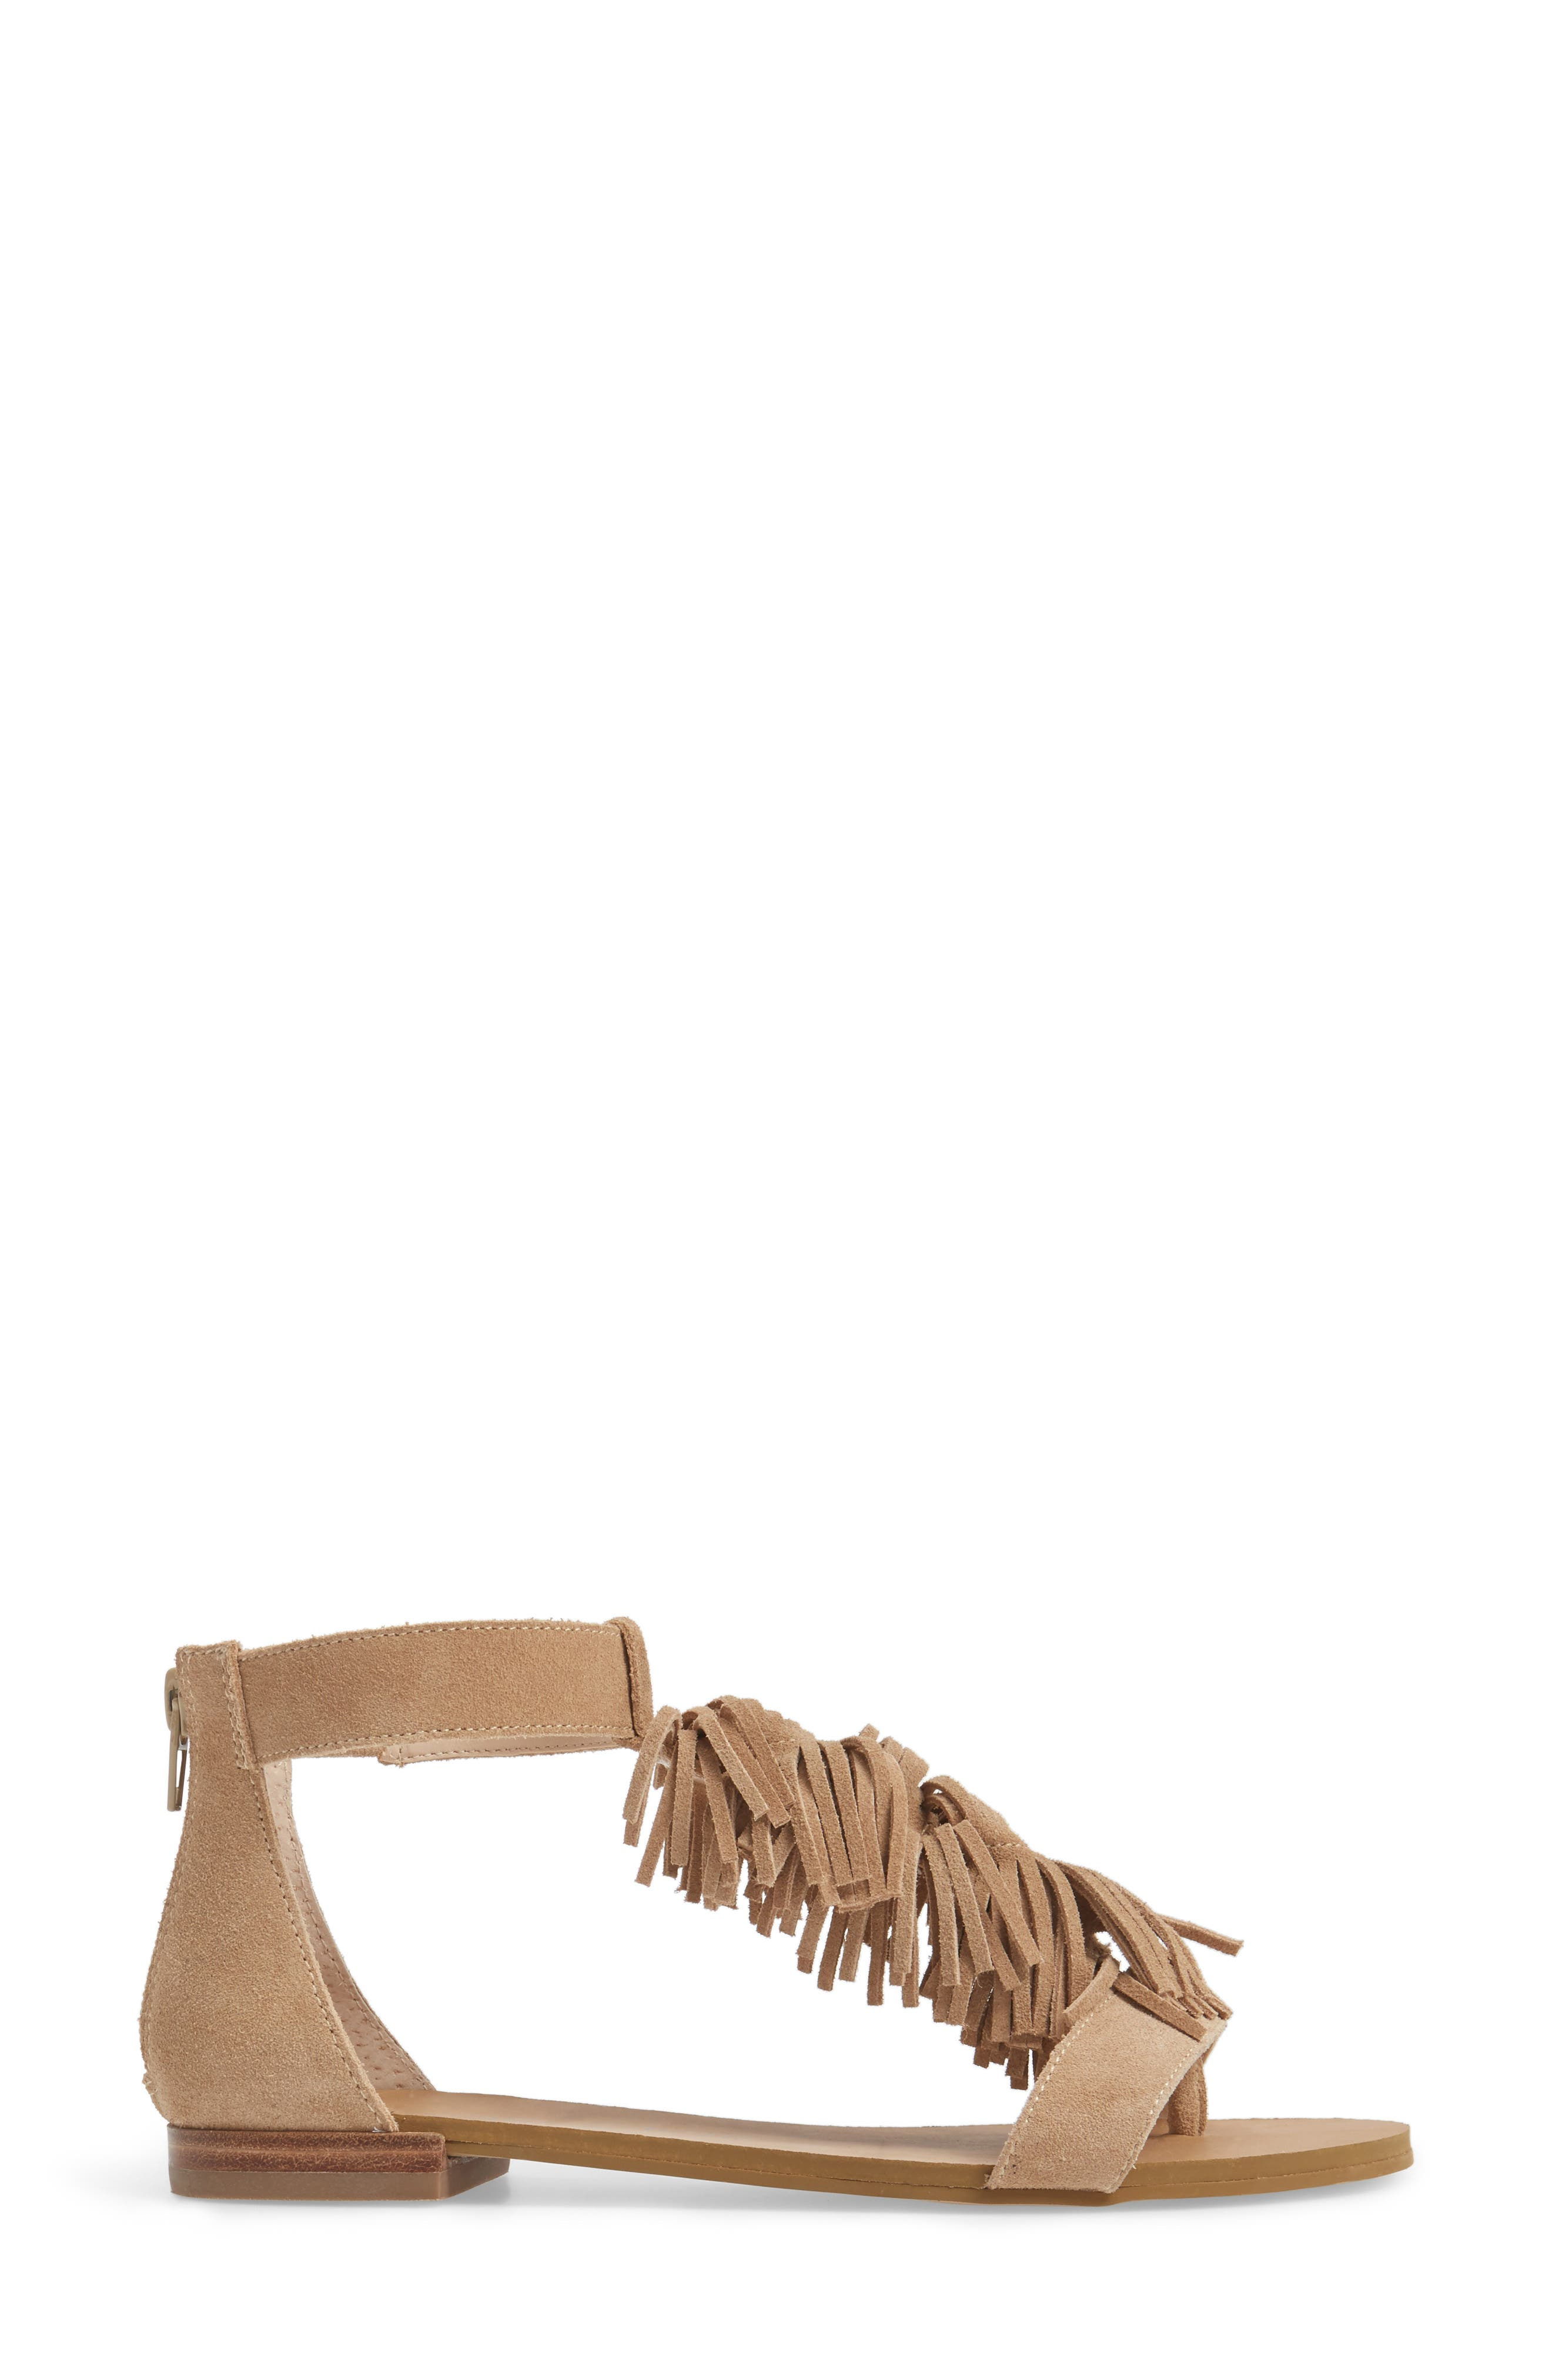 ,                             Koa Fringed T-Strap Sandal,                             Alternate thumbnail 3, color,                             200